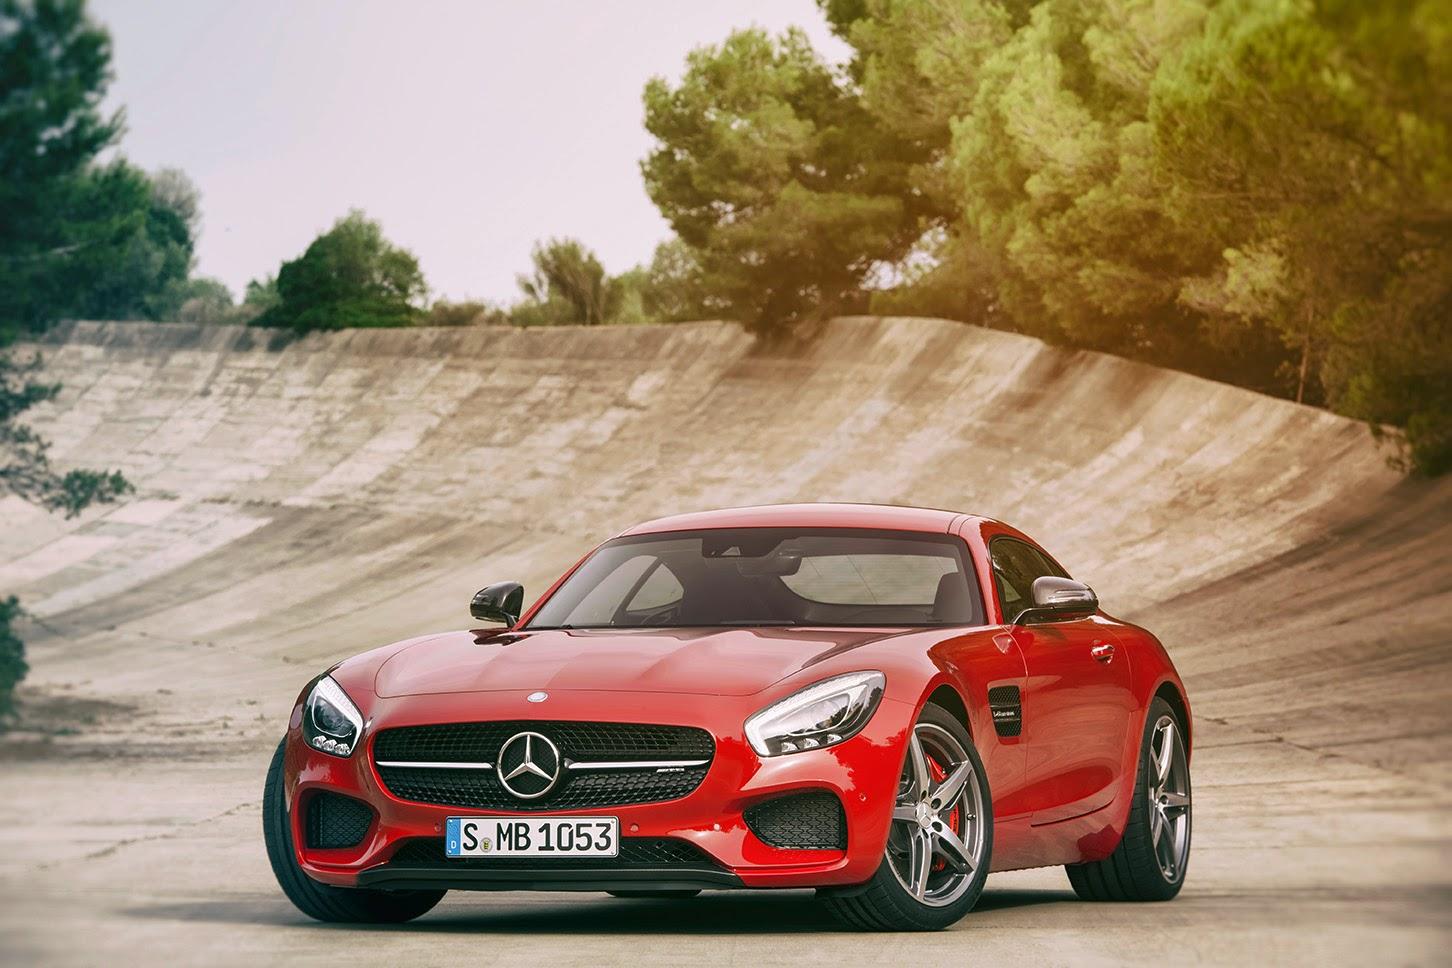 Mercedes Benz/AMG